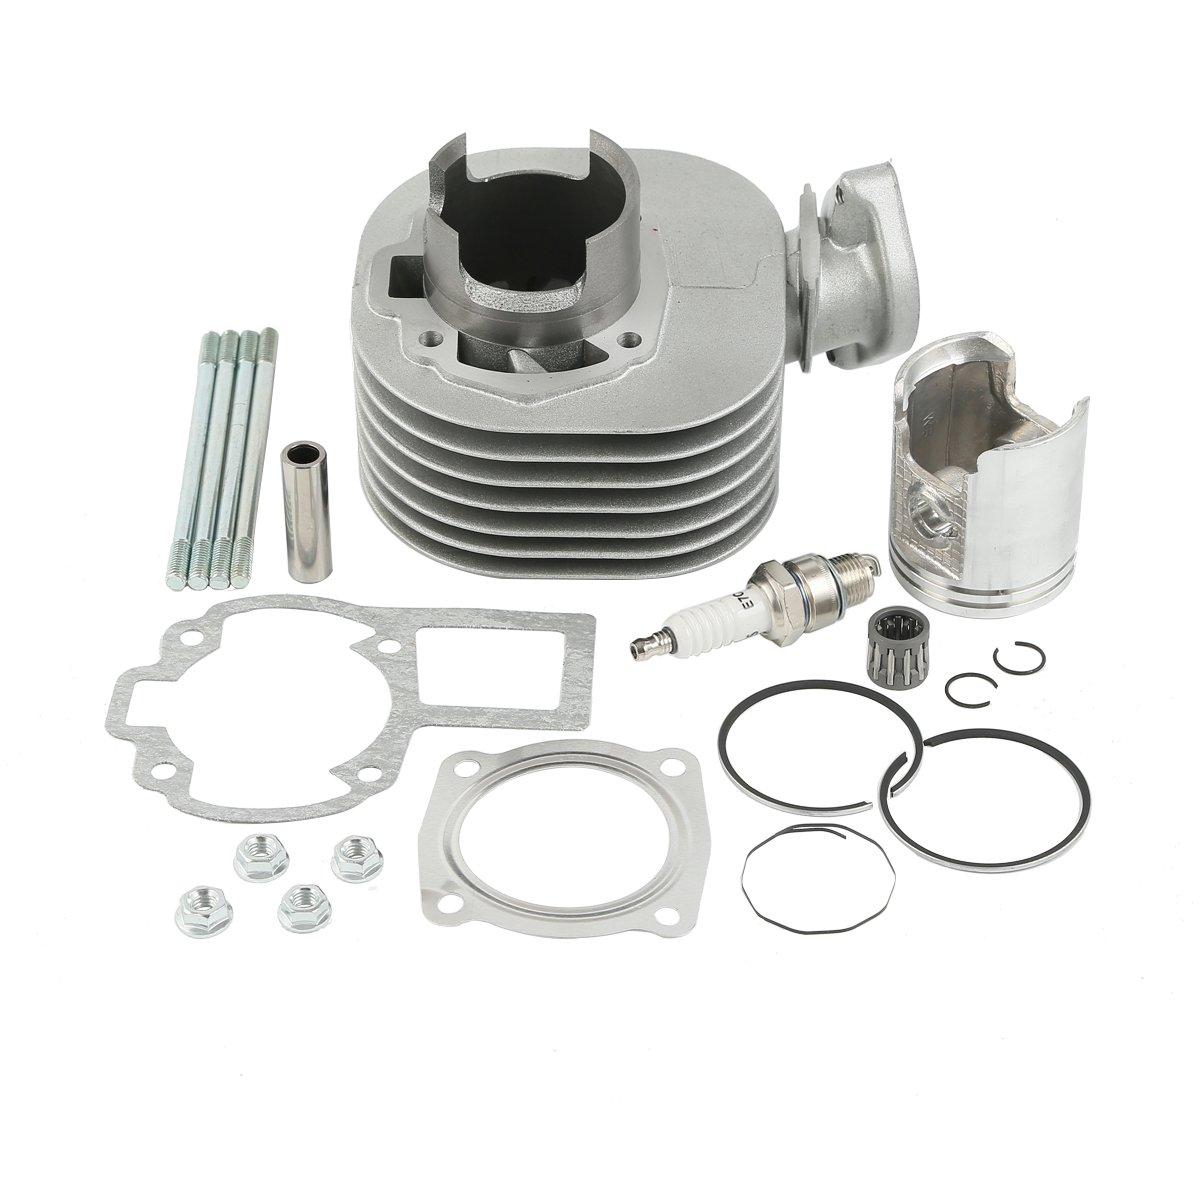 XMT-MOTO Cylinder Piston Top End Gasket Kit for Suzuki Quadsport LT 80 LT80 1987-2006(Replace Part Number:11210-40B01)